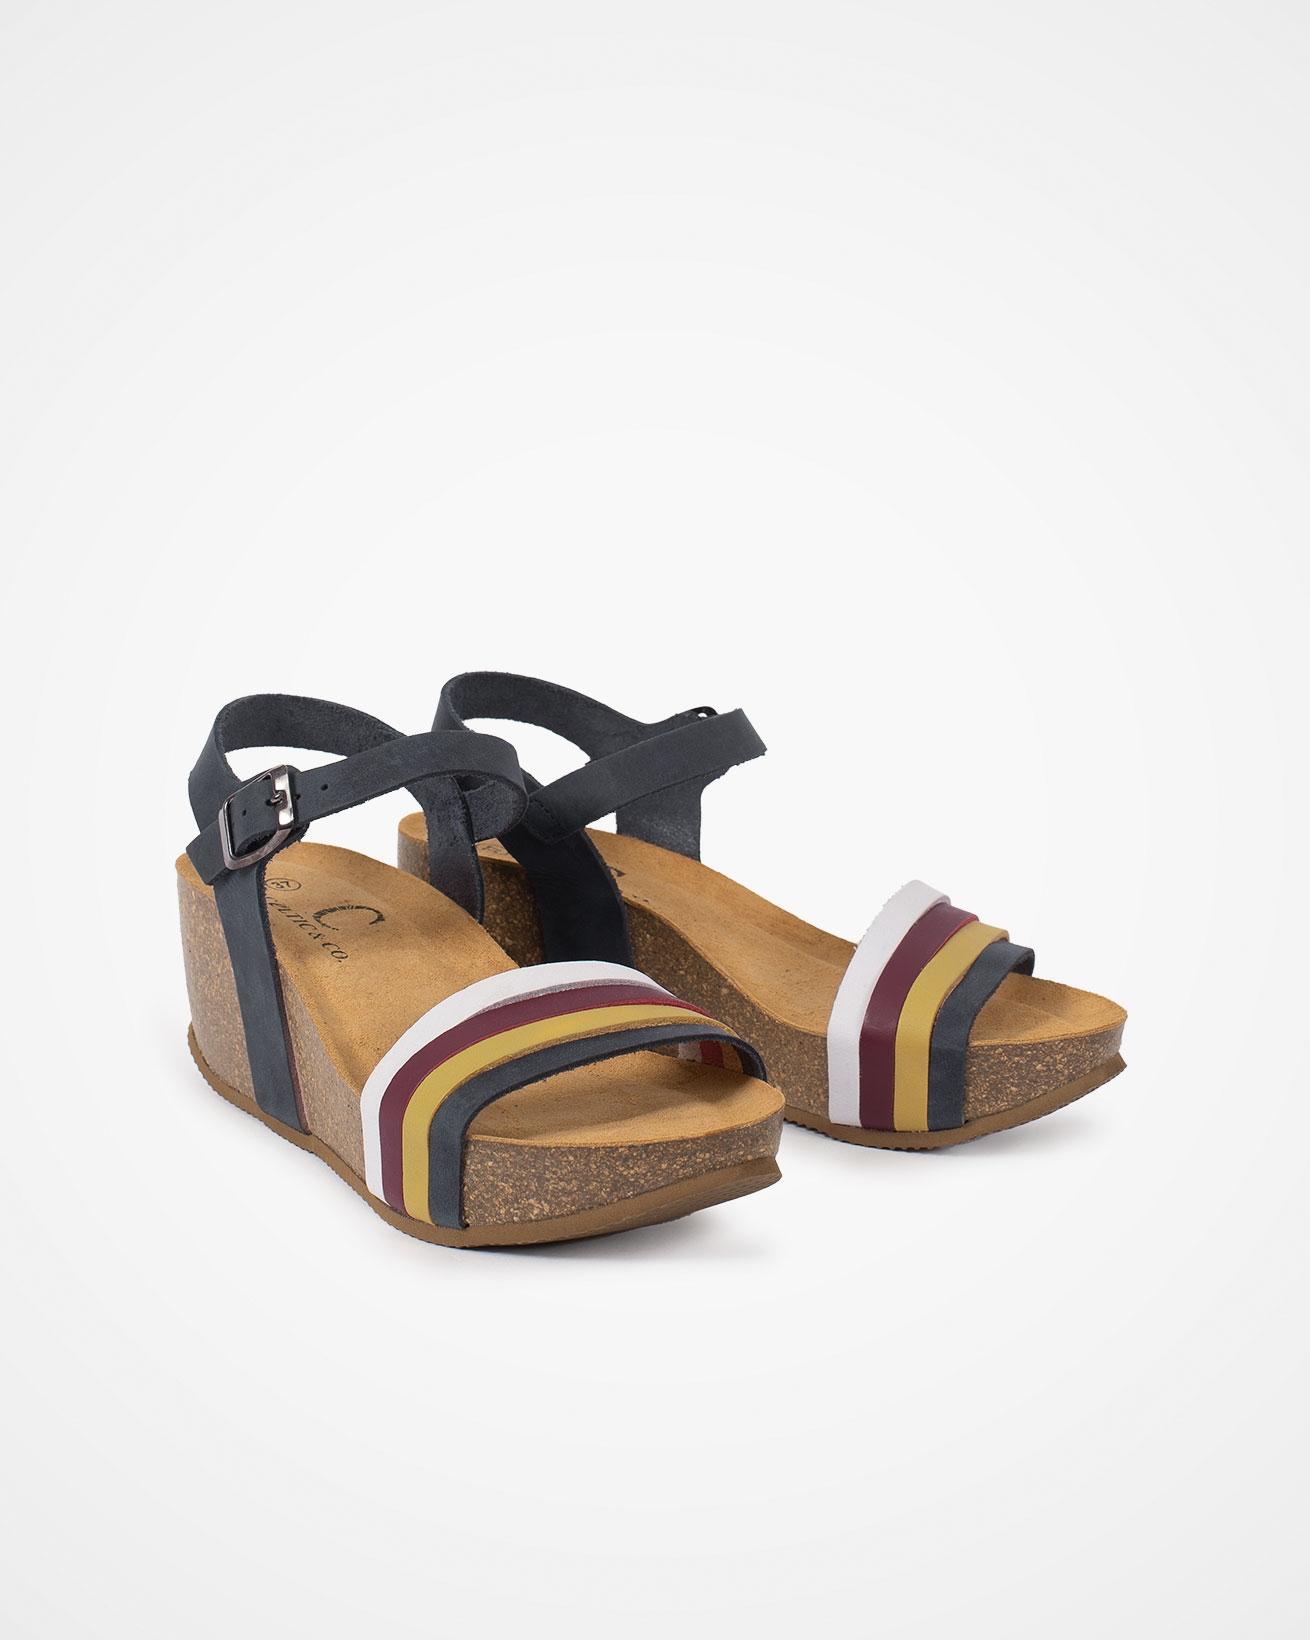 7790_multi-strap-sandal_navy_pair.jpg